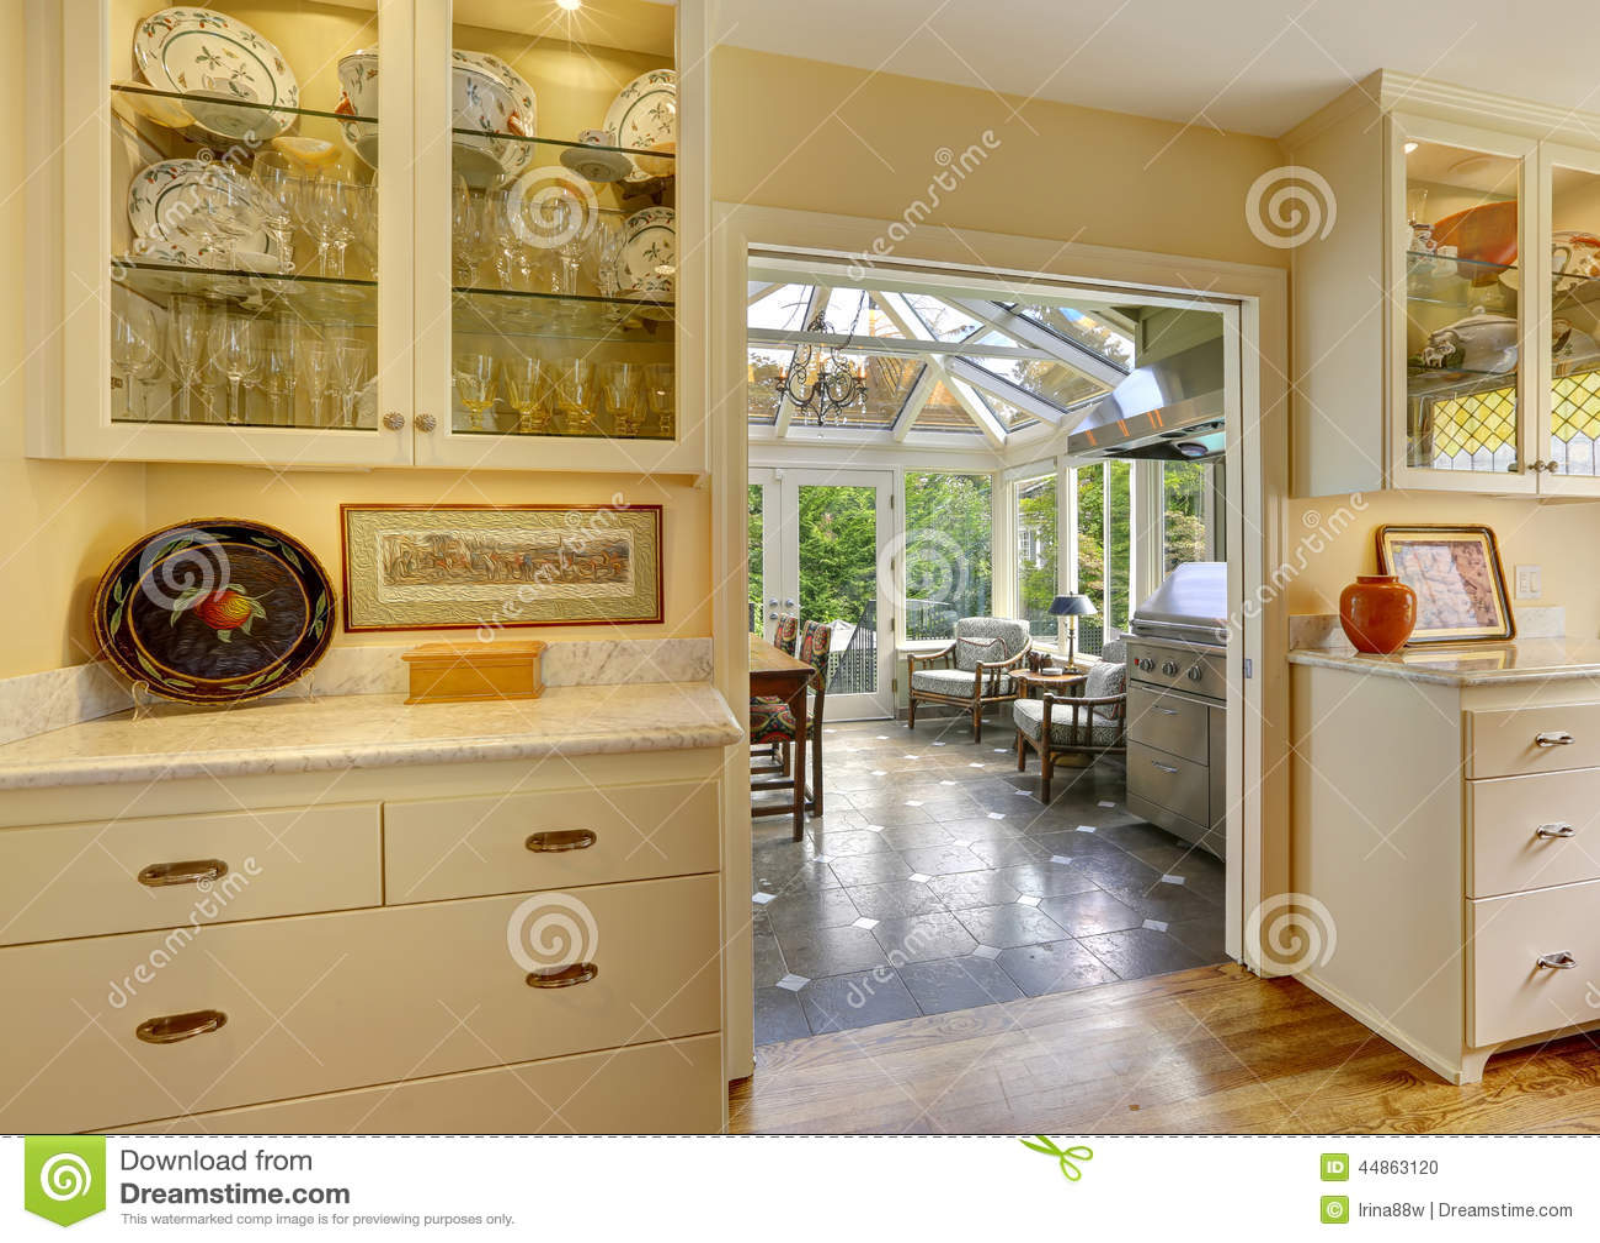 patio kitchen corner tables 有出口的厨房室对在日光浴室的露台区域库存照片 图片包括有里面 建筑师 有出口的厨房室对在日光浴室的露台区域